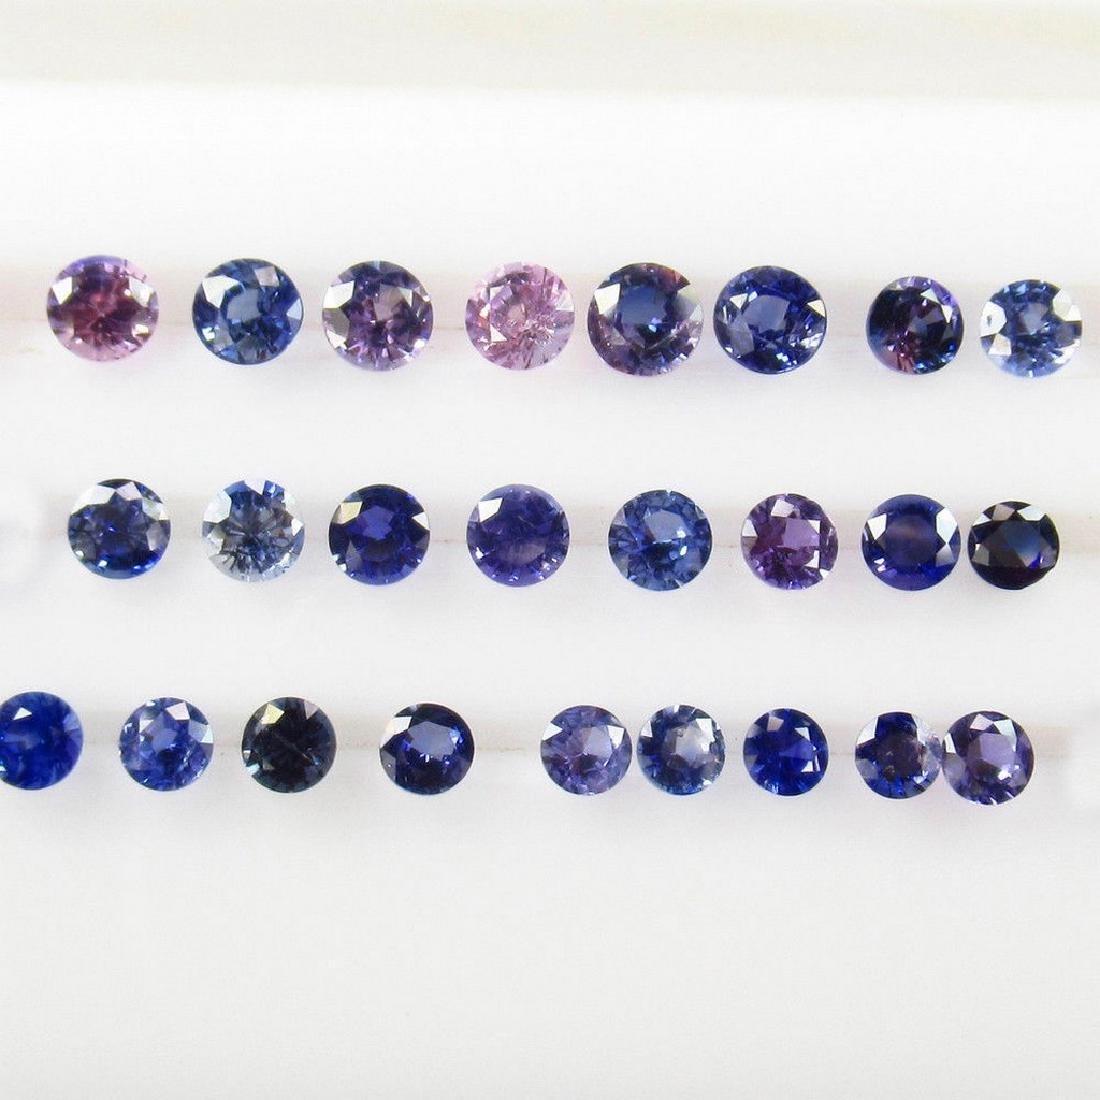 4.72 Carat 32 Loose Unheated Blue Sapphire Round Lot